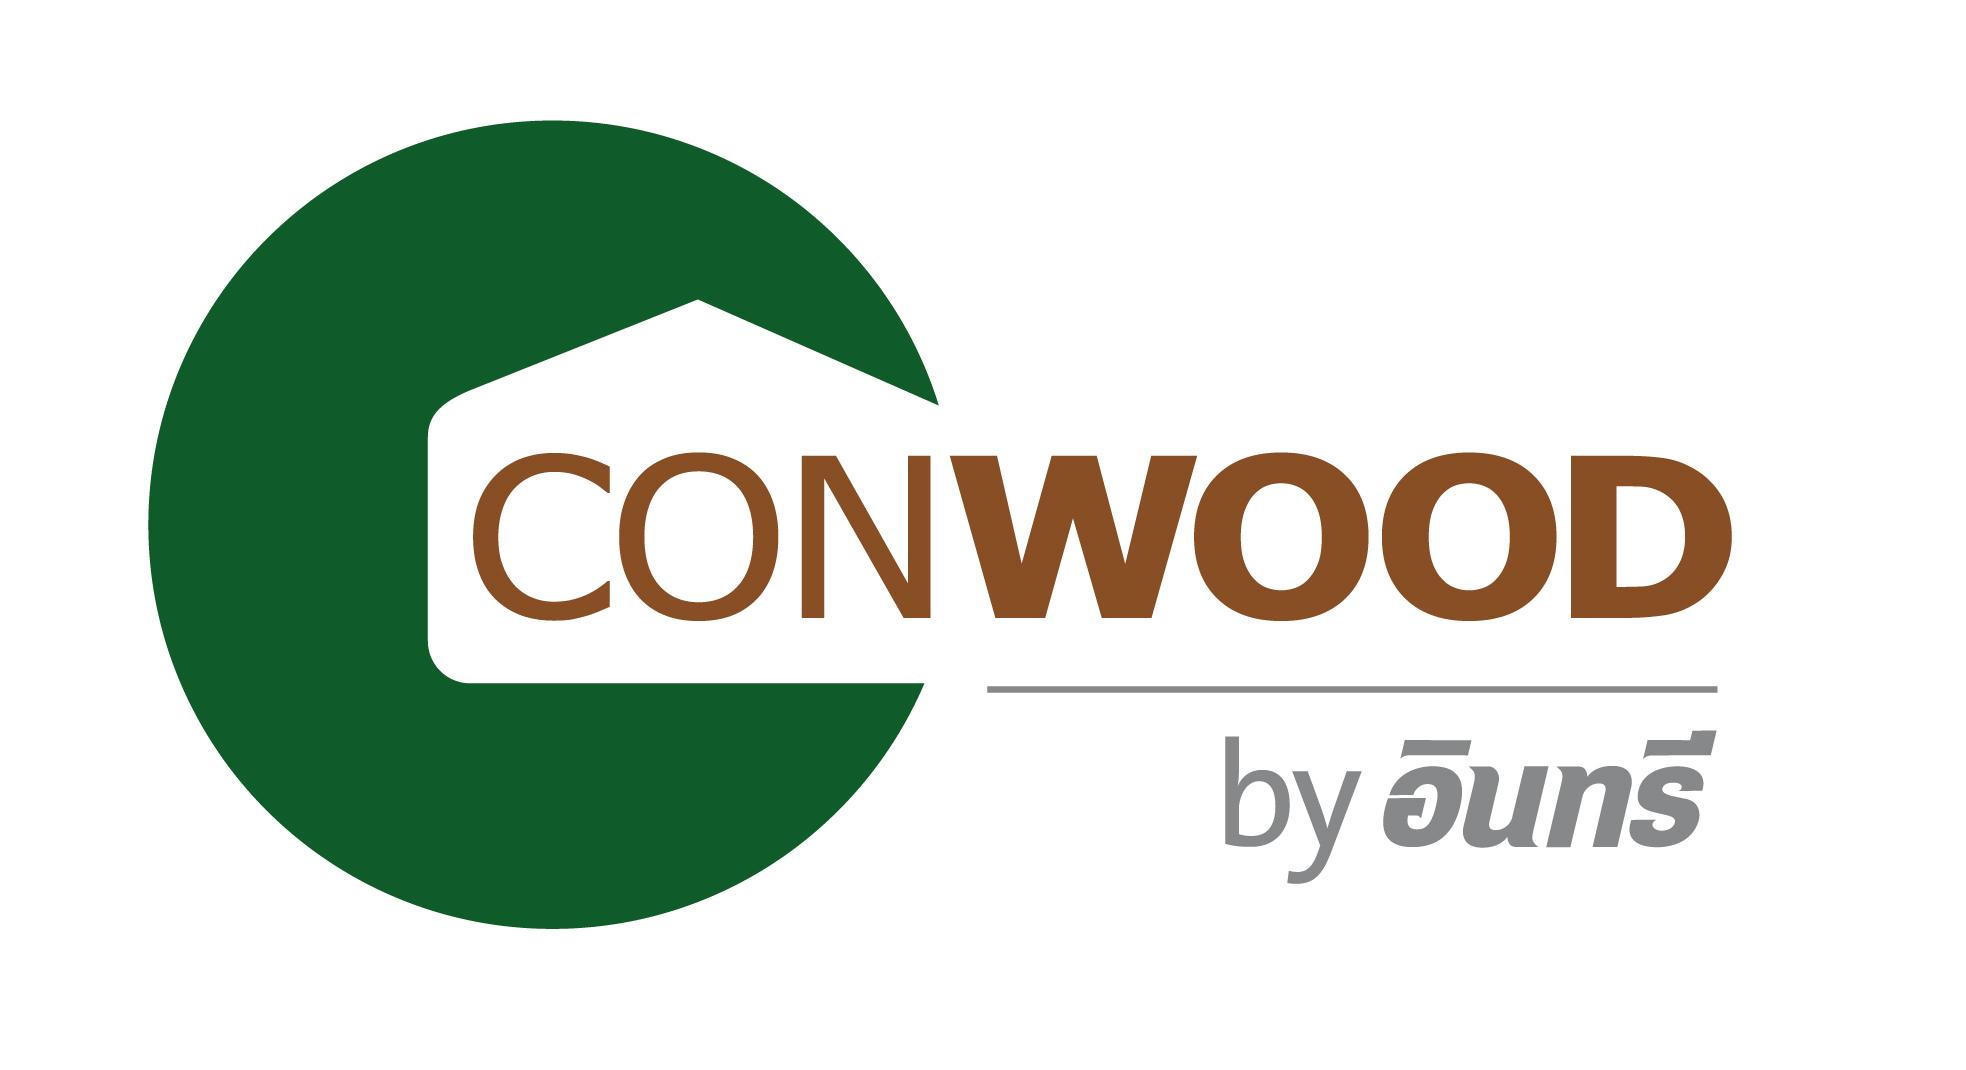 Conwood_logo.jpg